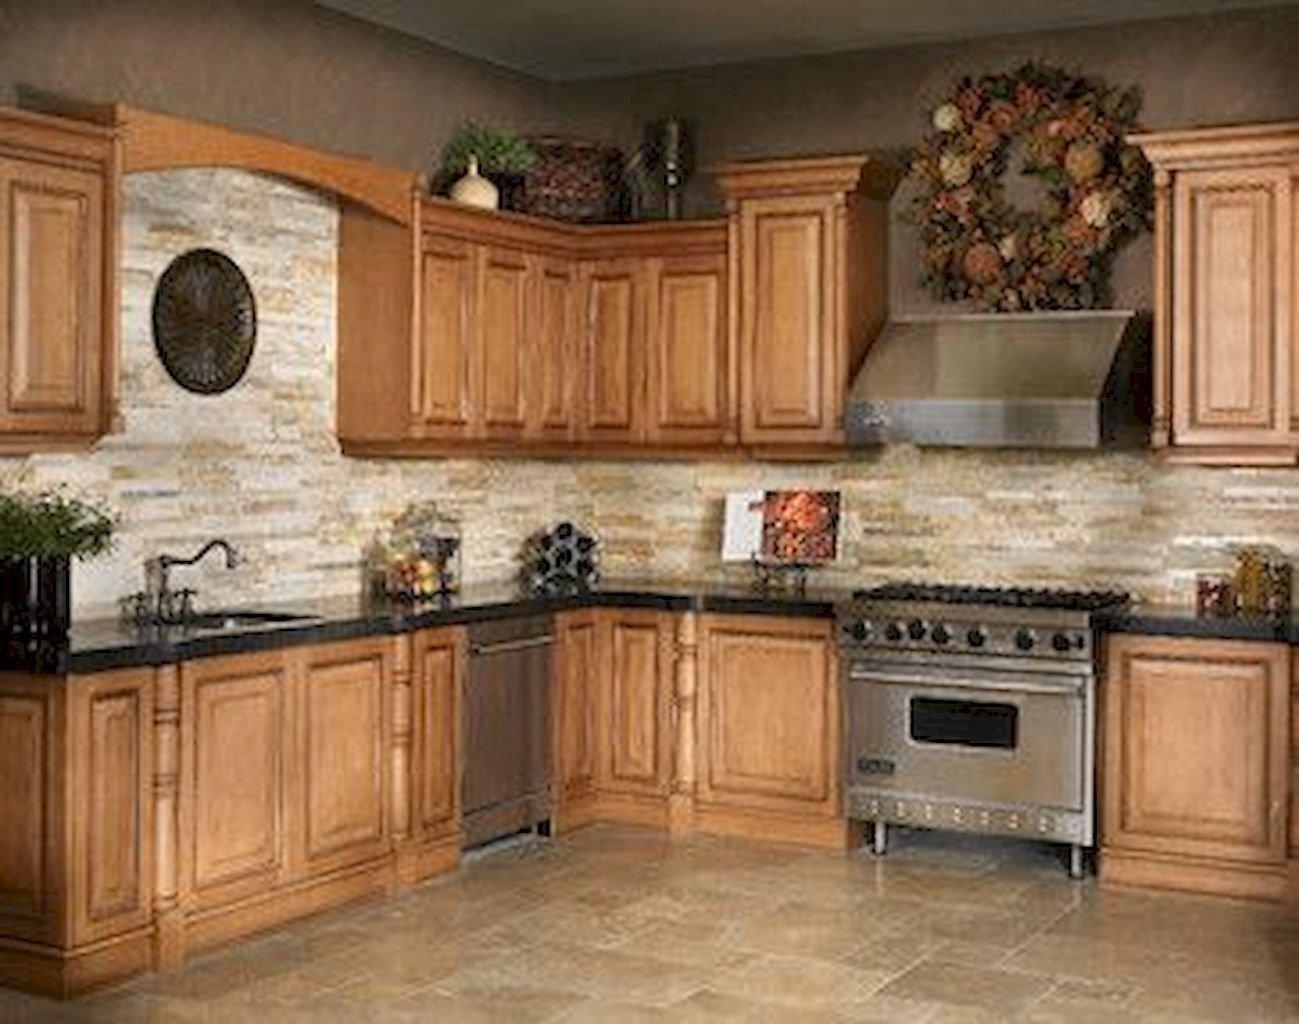 10 Best Kitchen Ideas With Oak Cabinets warm kitchen colors with white cabinets honey oak kitchen cabinets 2020